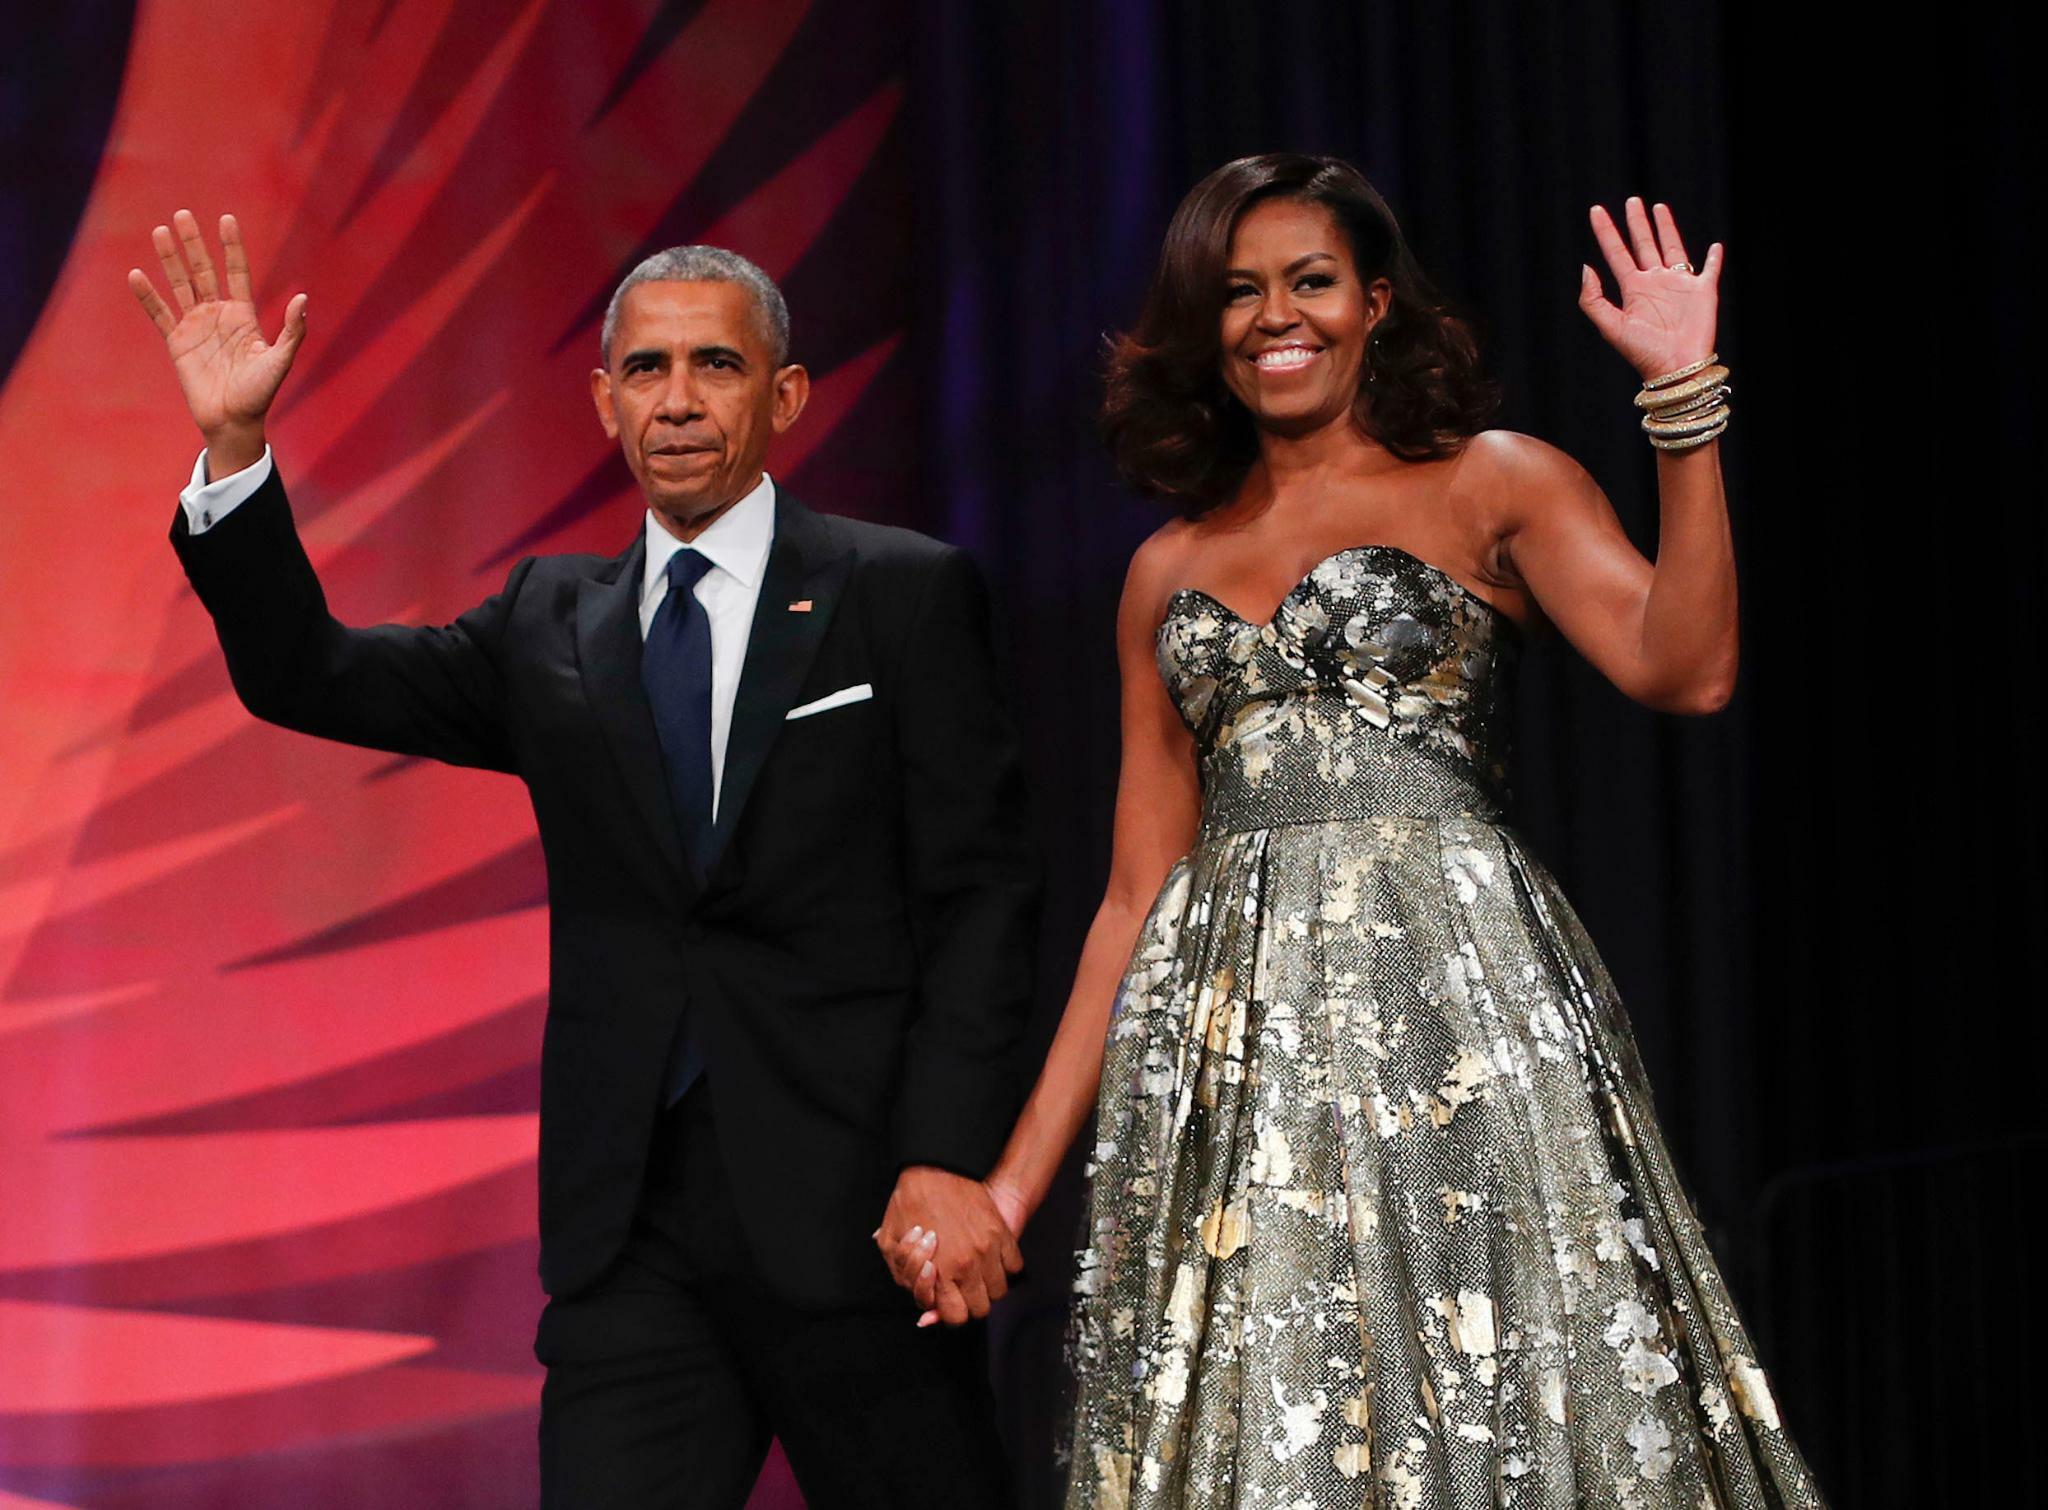 Barack Obama Presidency Education Mother Biography 13